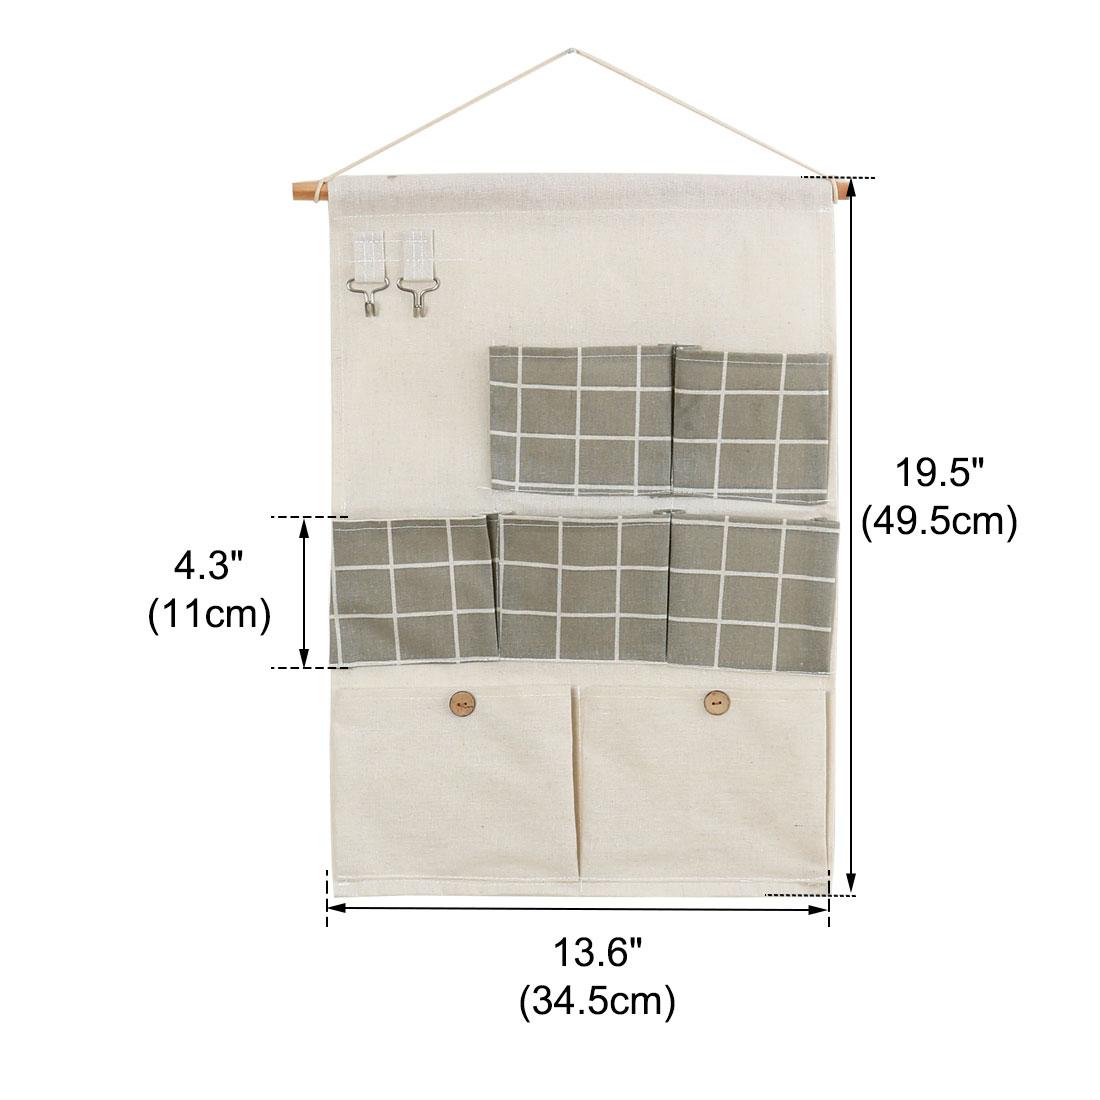 "Closet Foldable Hanging Storage Bag 19.5"" x 13.6"" Organizer Gray Square Pattern - image 5 de 7"